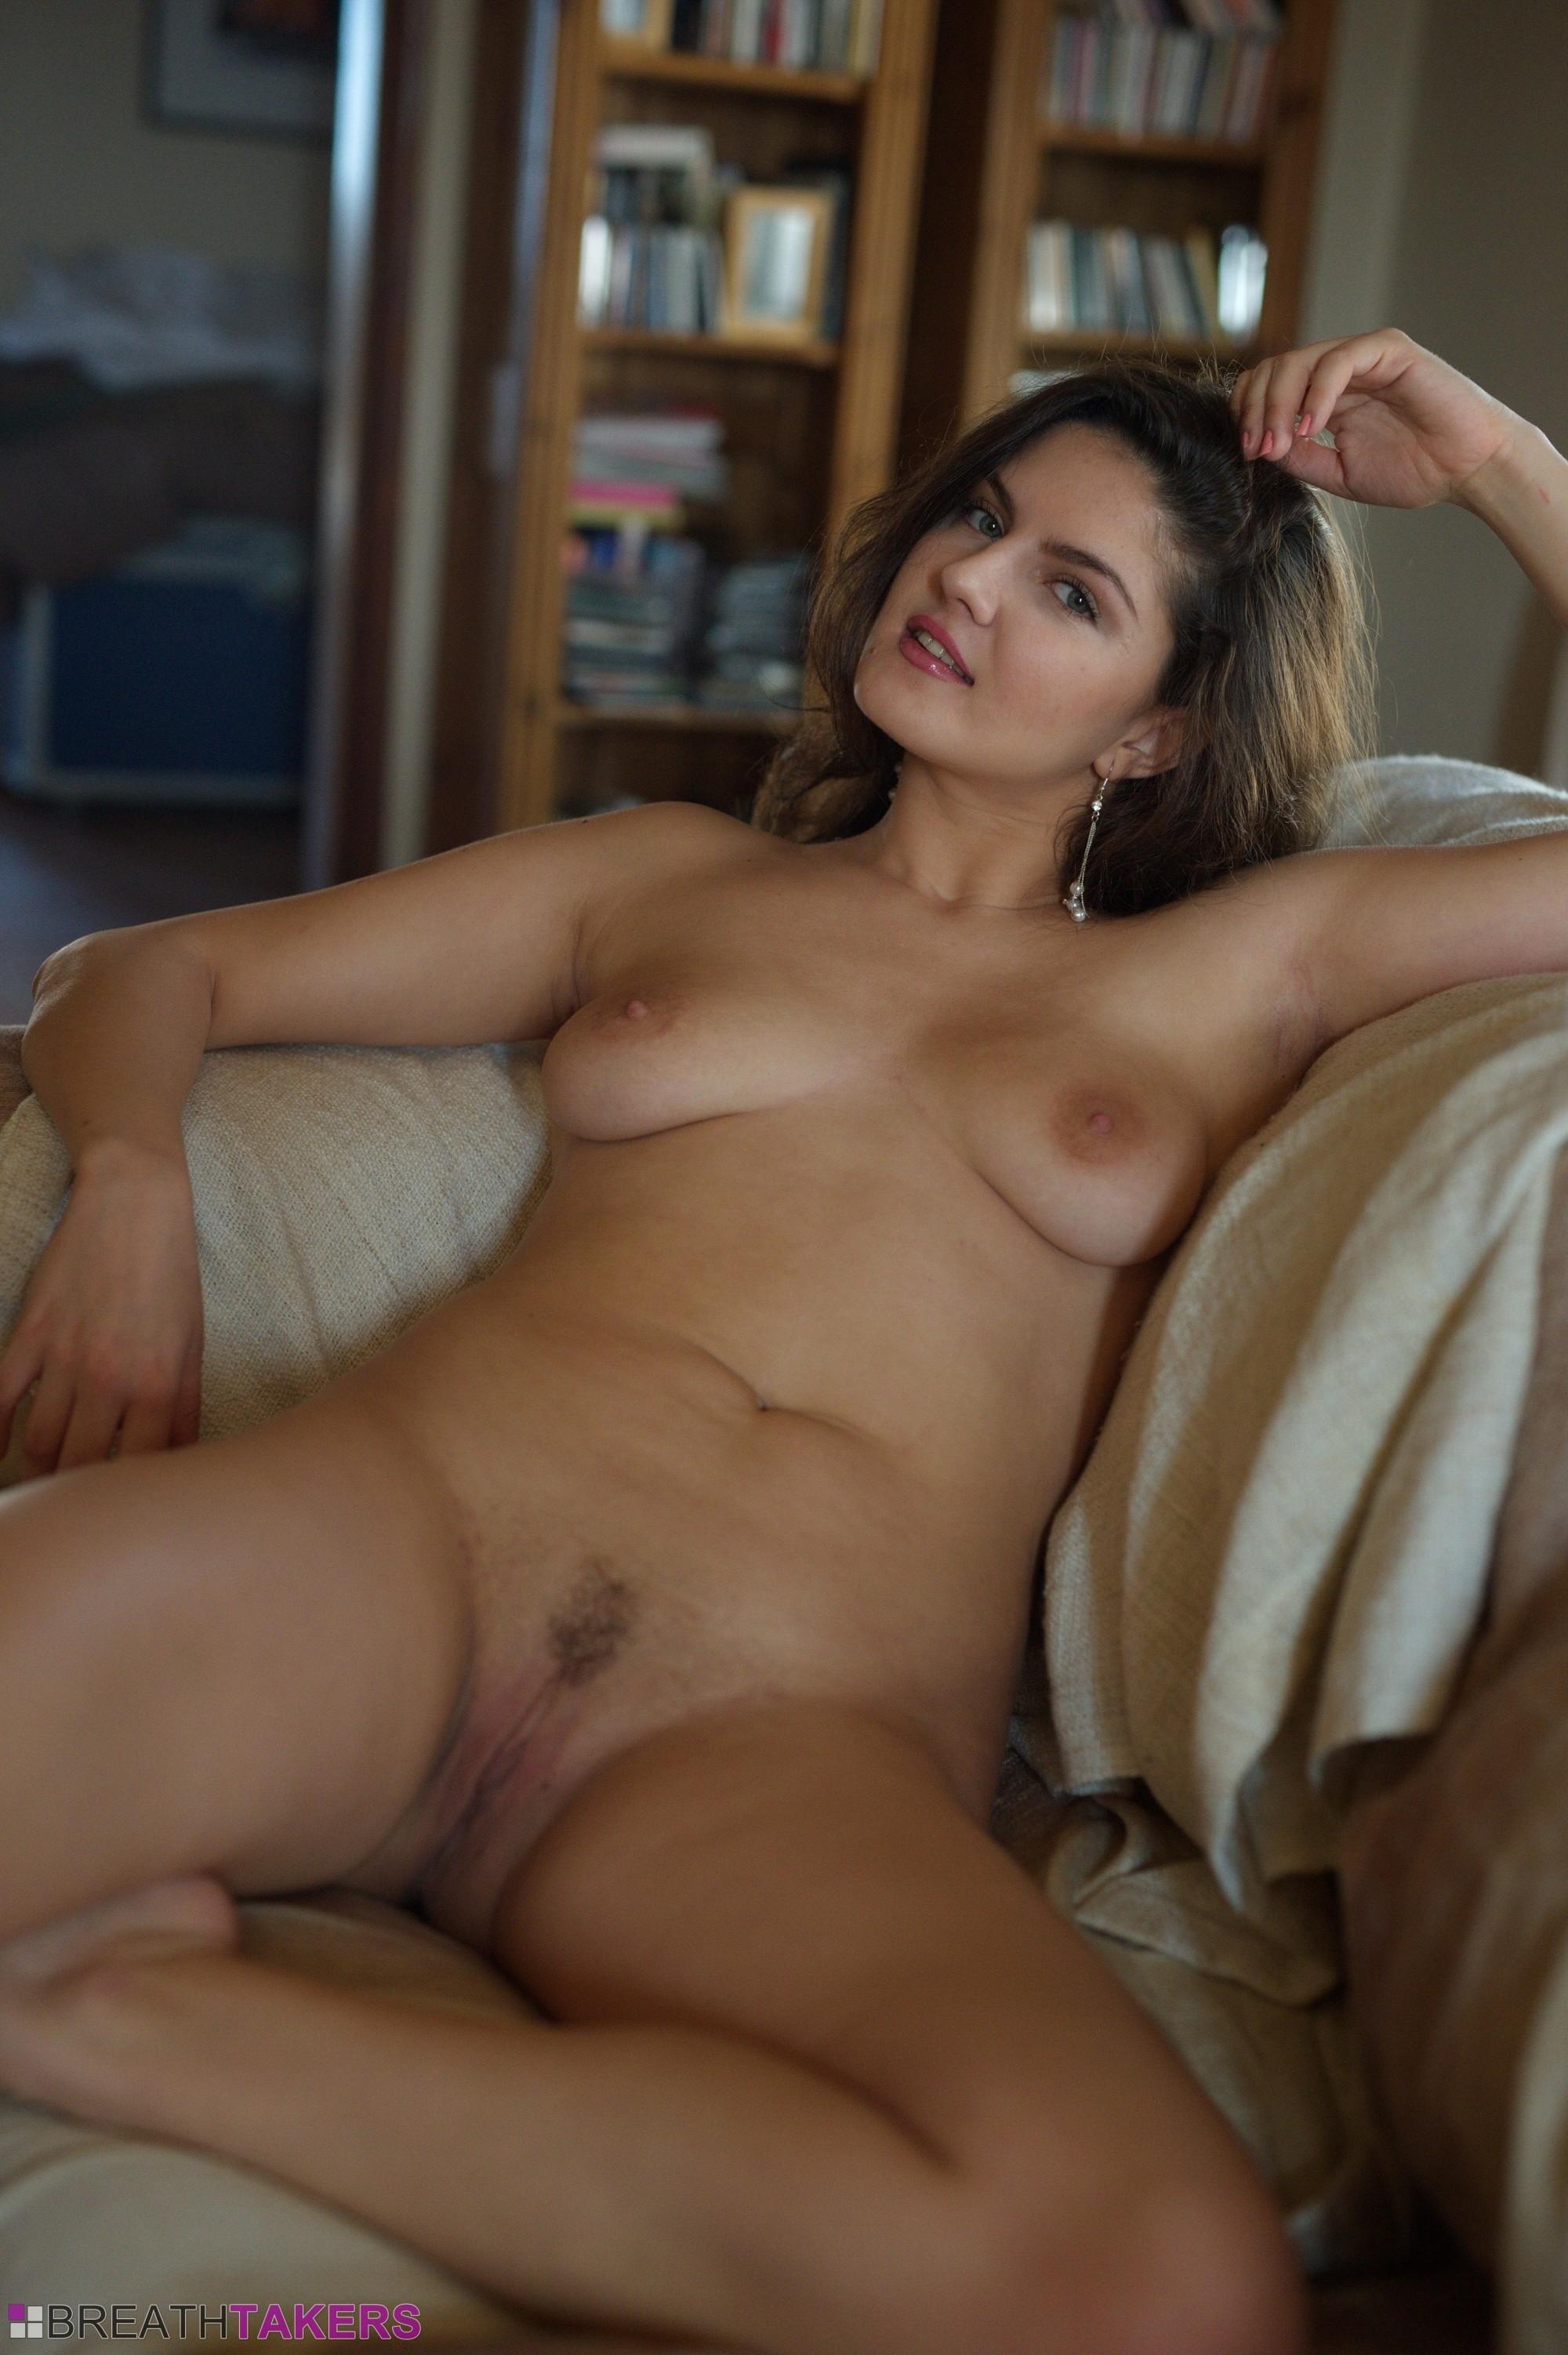 italian hot babes topless